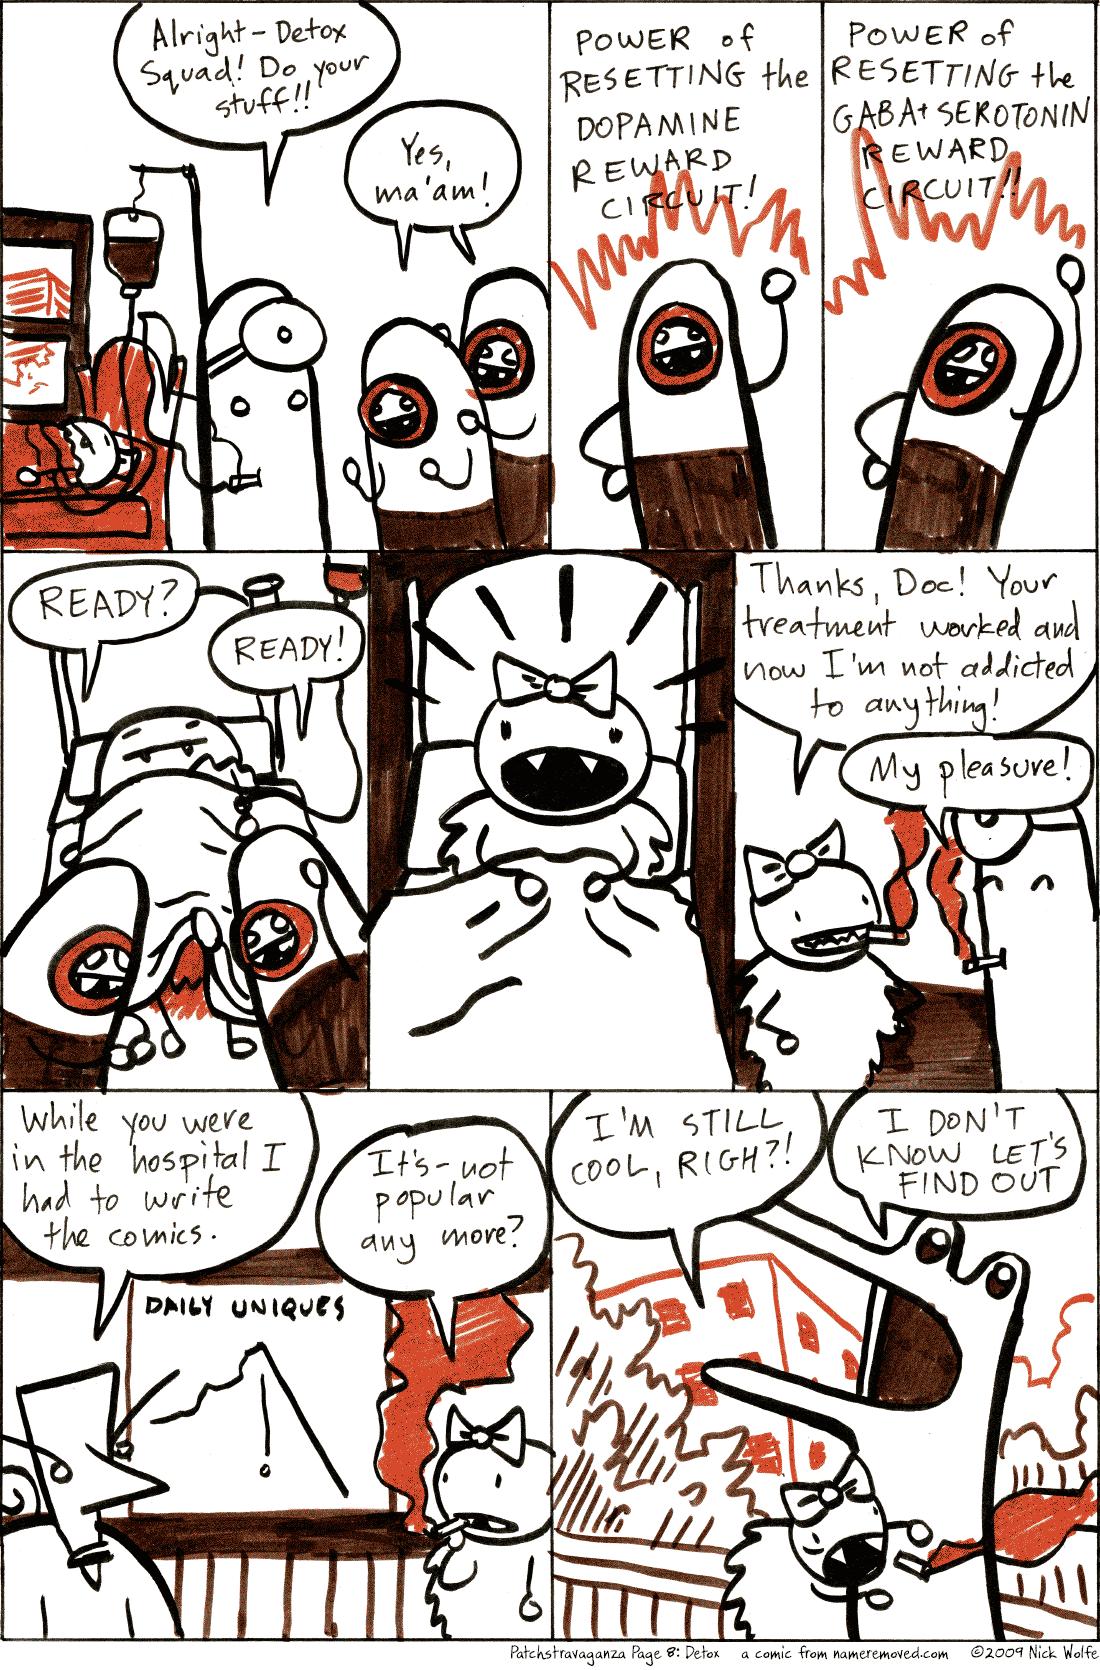 Patchstravaganza Page 8: Detox